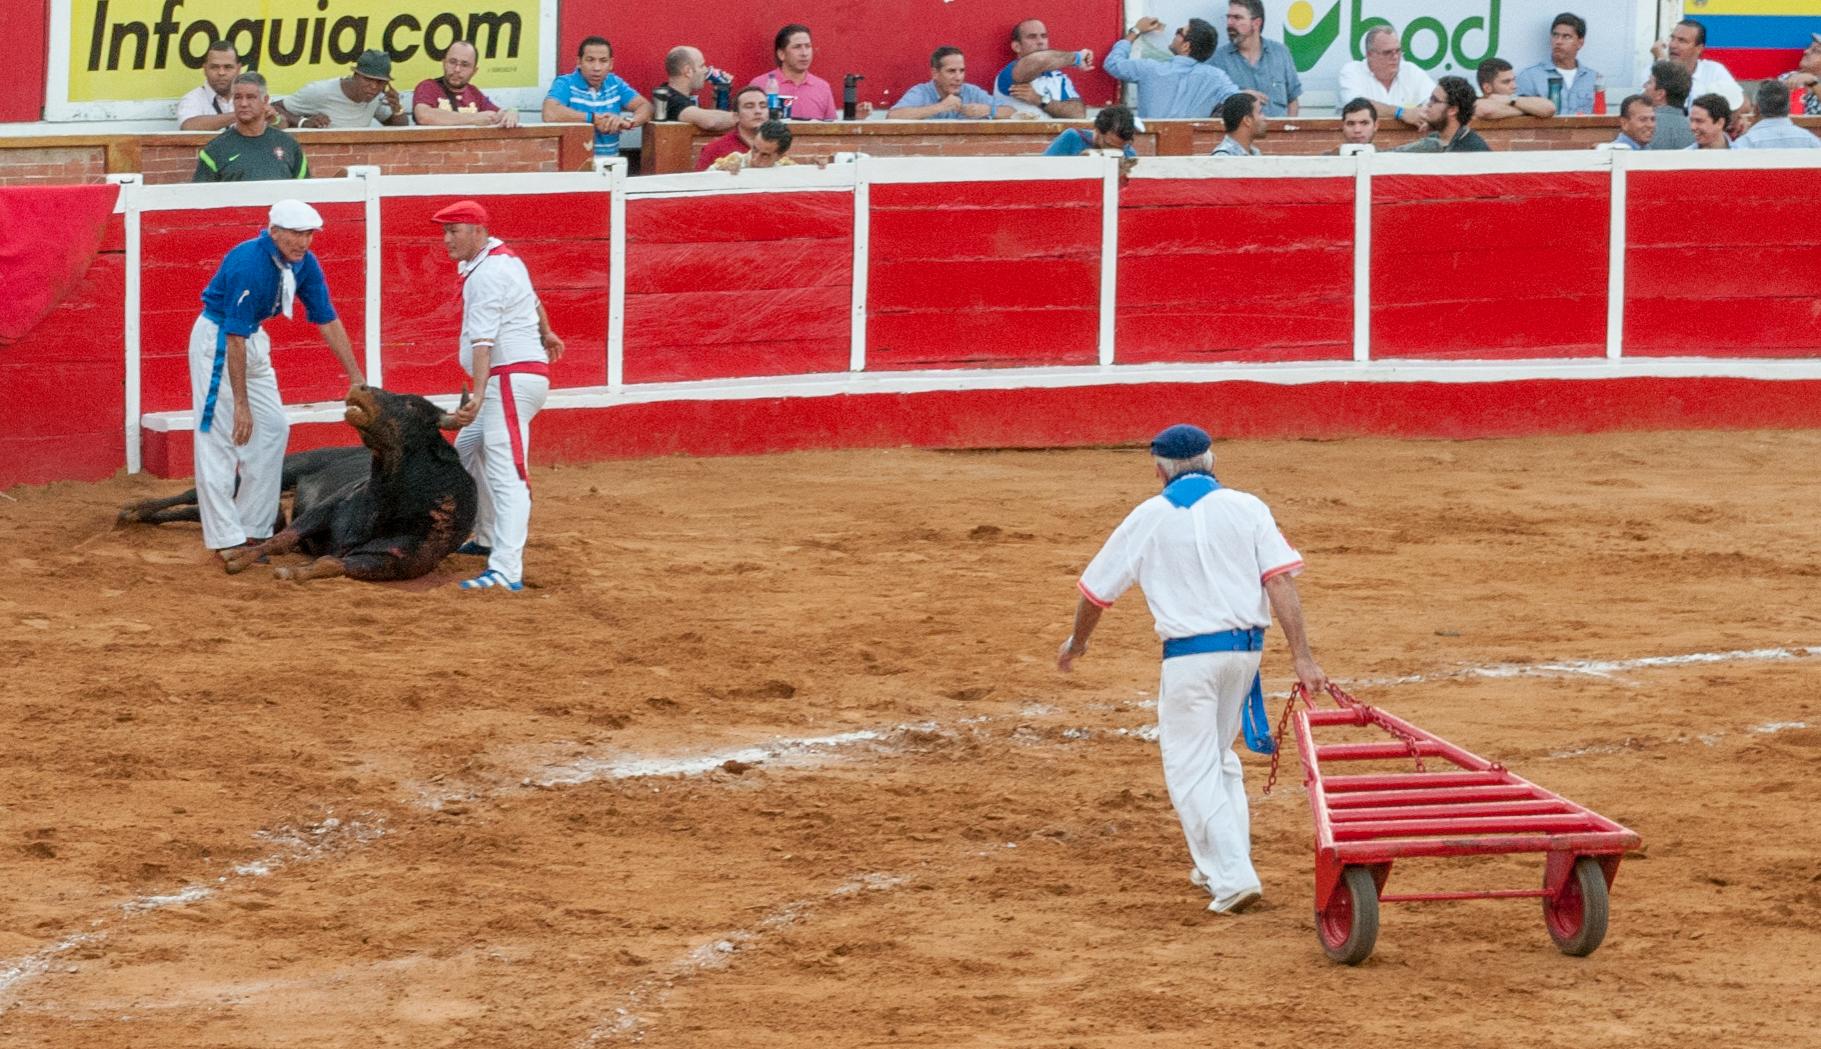 Plaza_de_Toros_Monumental_de_Maracaibo,_Corrida_01.jpg